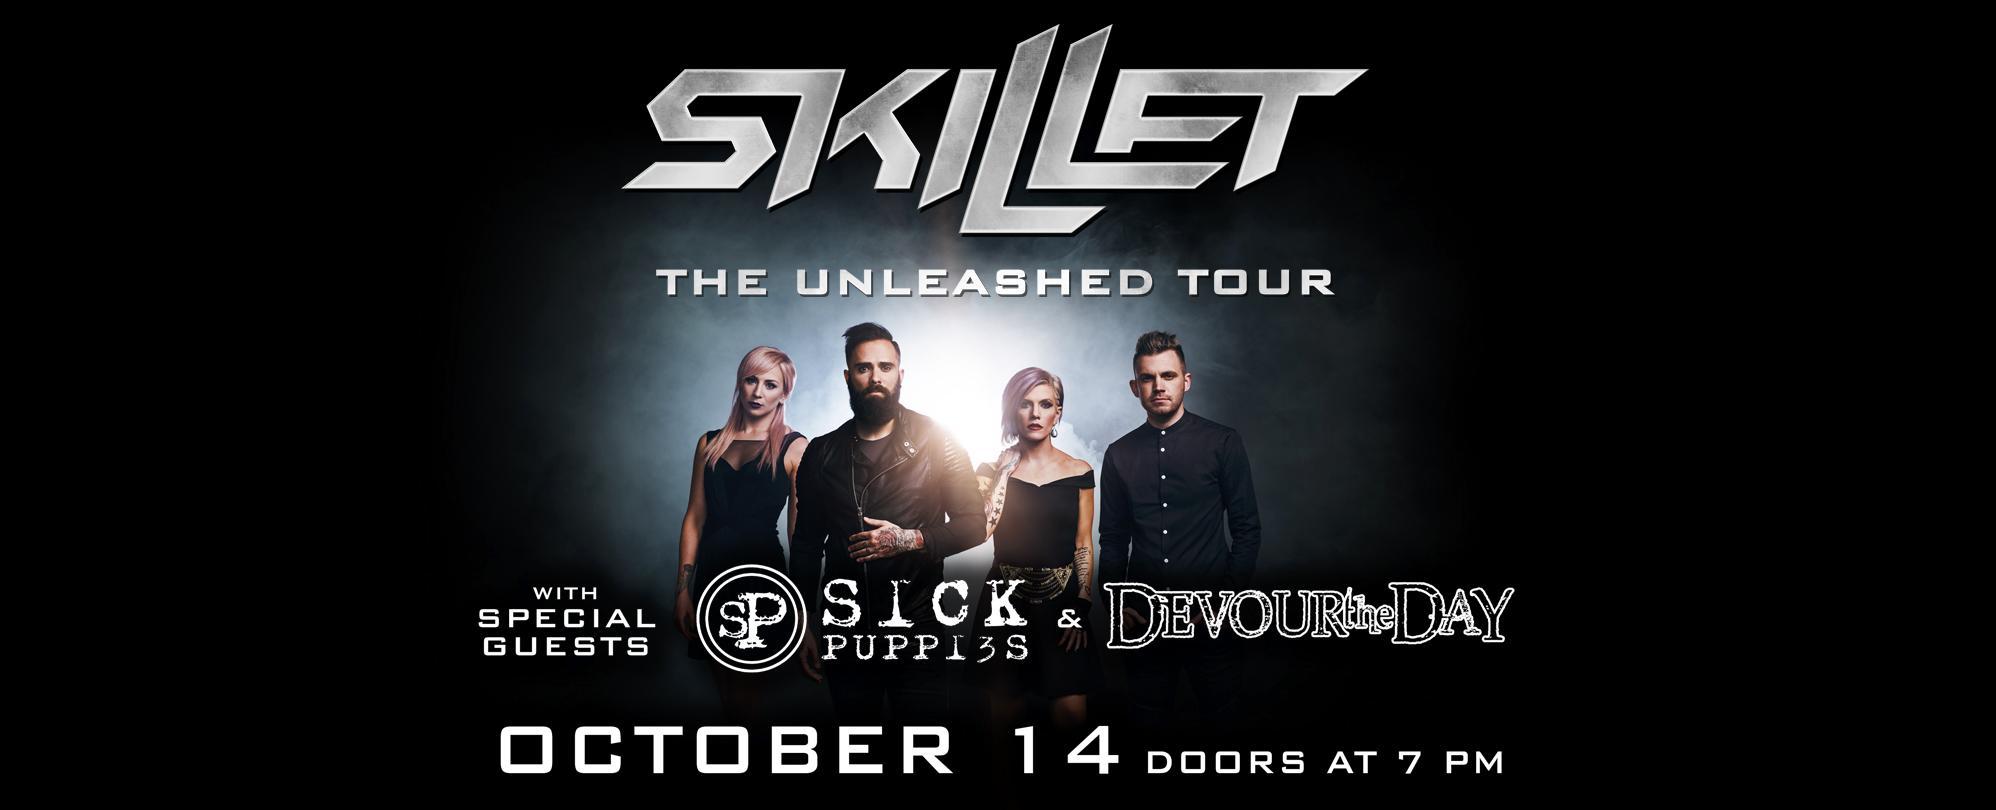 Skillet - Unleashed Tour 2016